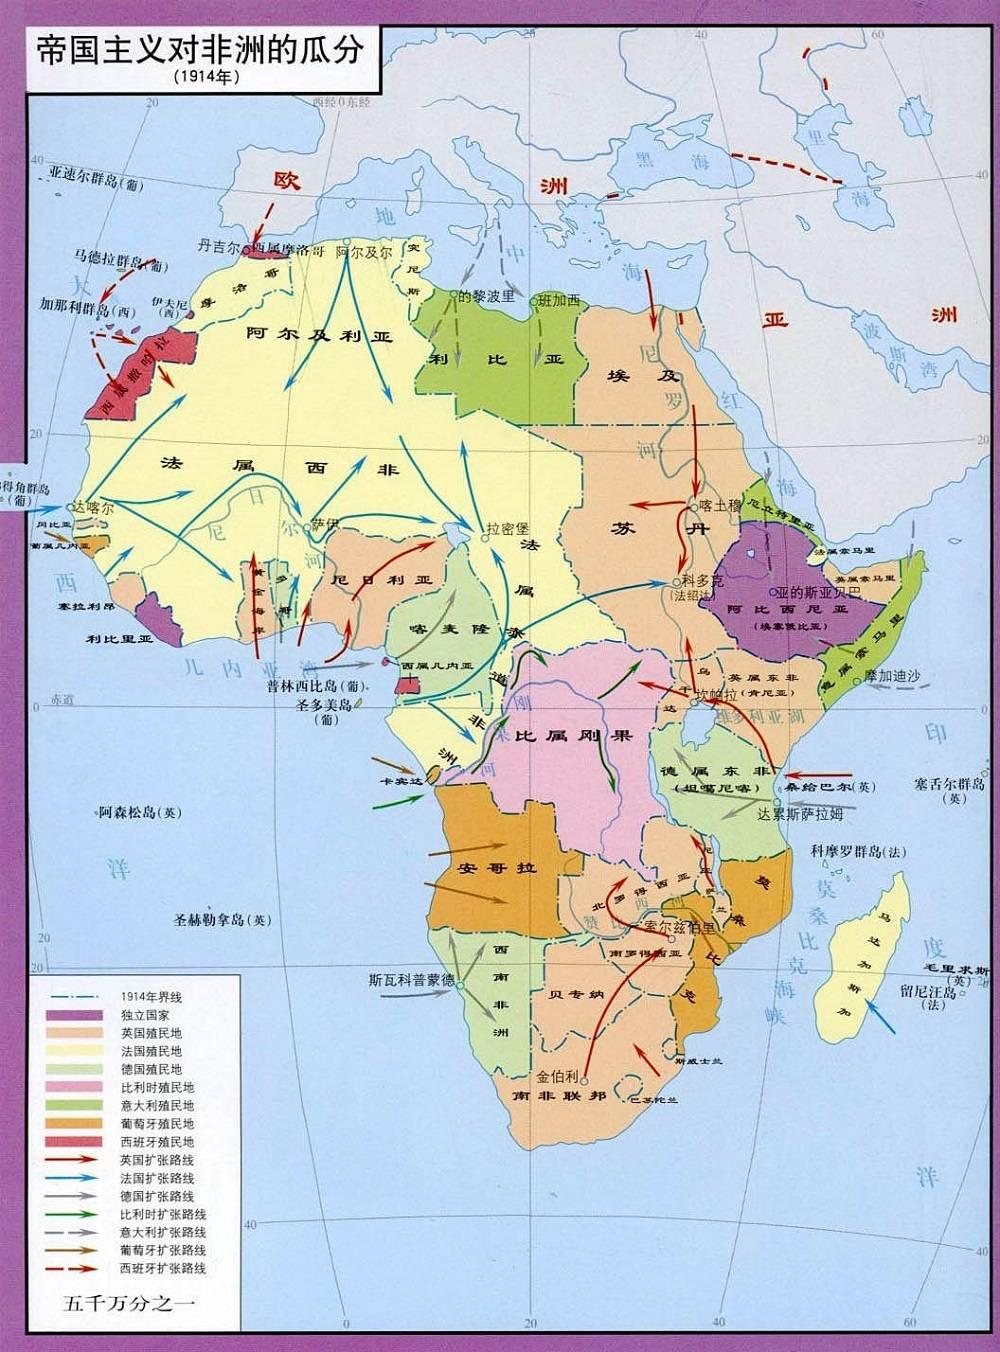 卢旺达人均gdp_卢旺达人均gdp曲线图